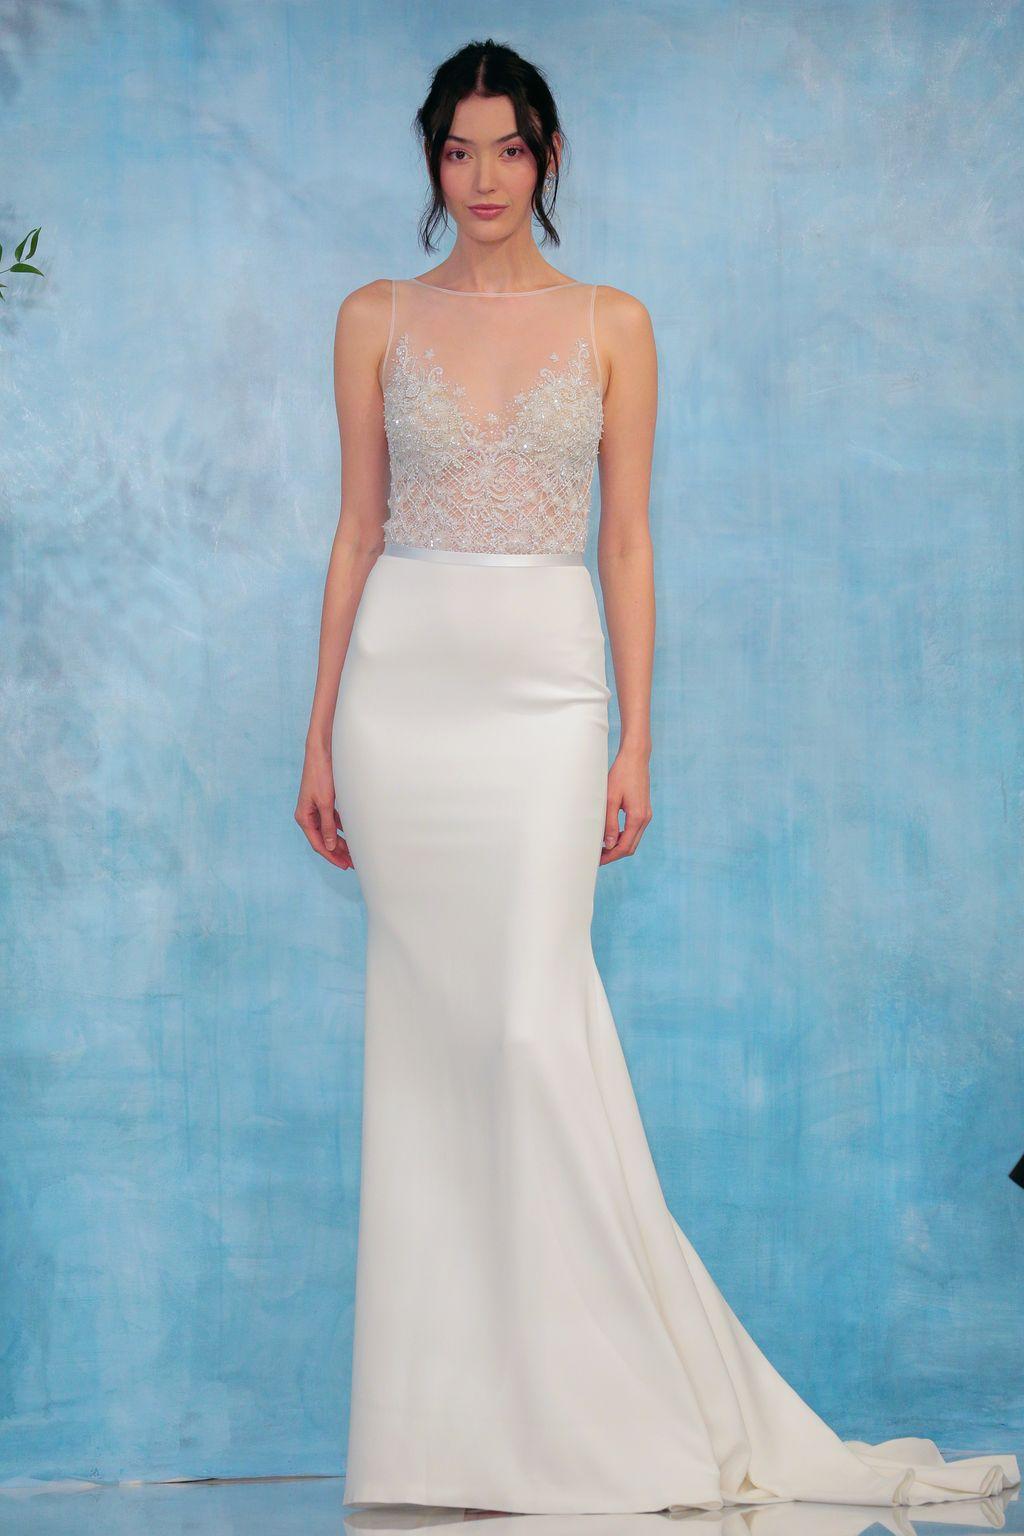 Theia Bridal Couture 2018 Trunk Show Bridal Parlour,Maggie Sottero Wedding Dress Prices